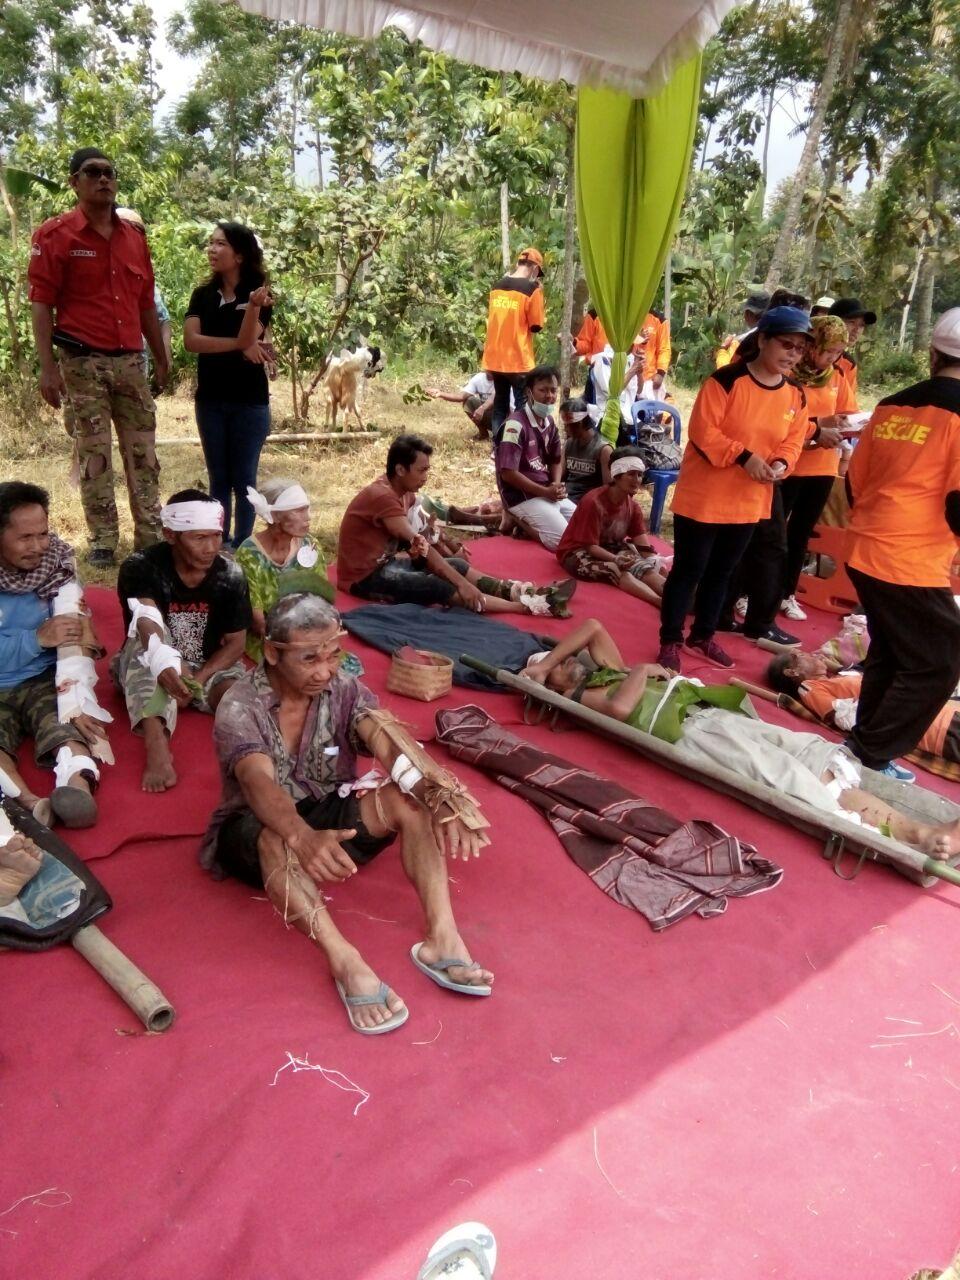 Latihan penanggulangan bencana di Pandansari Kec. Ngantang